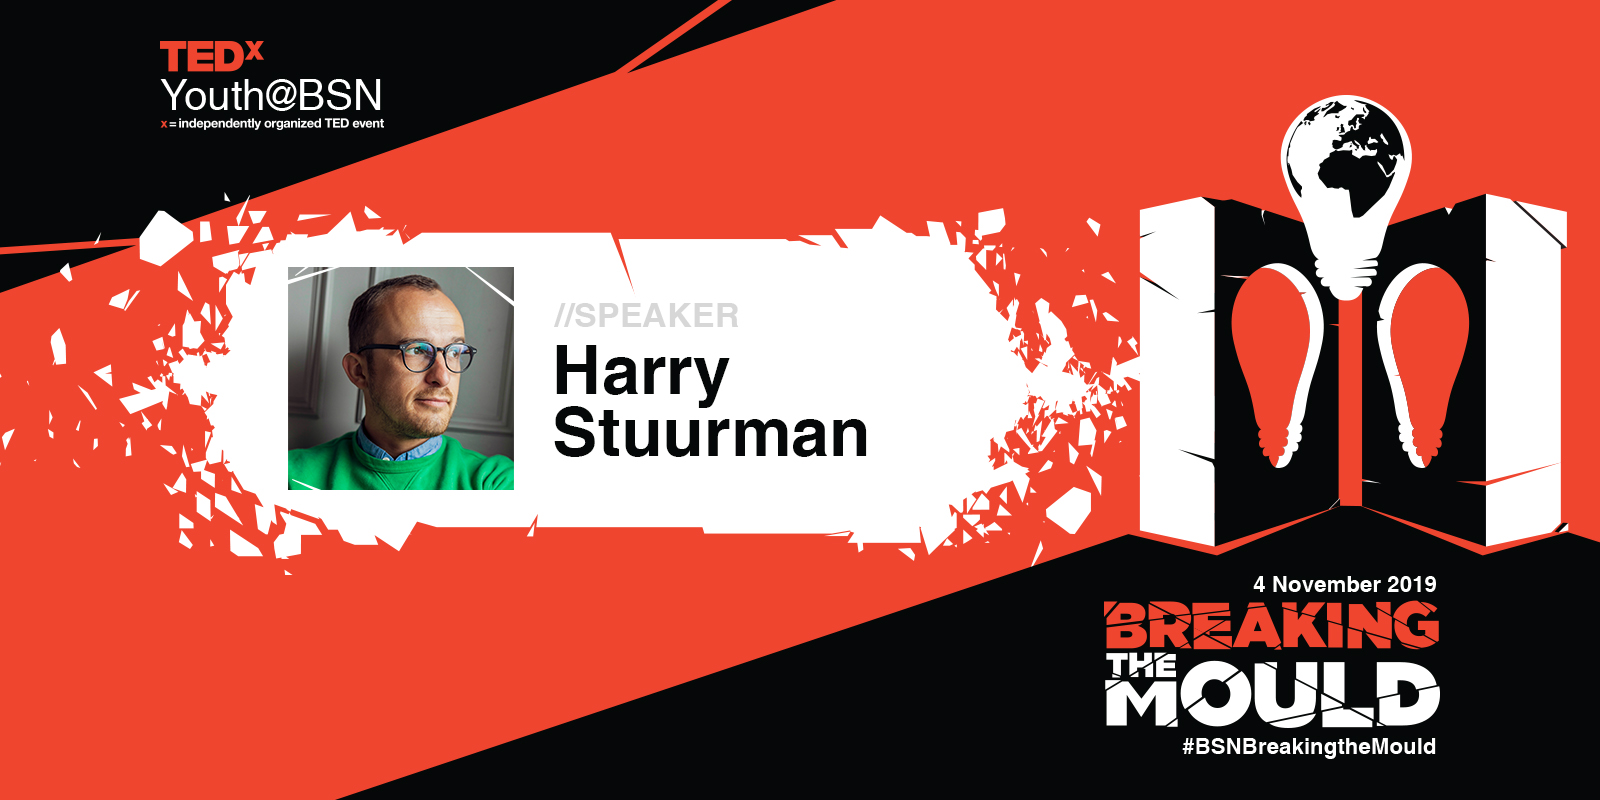 Accept yourself, break the mould and embrace your true, creative self | Harry Stuurman | TEDxYouthBSN Speaker